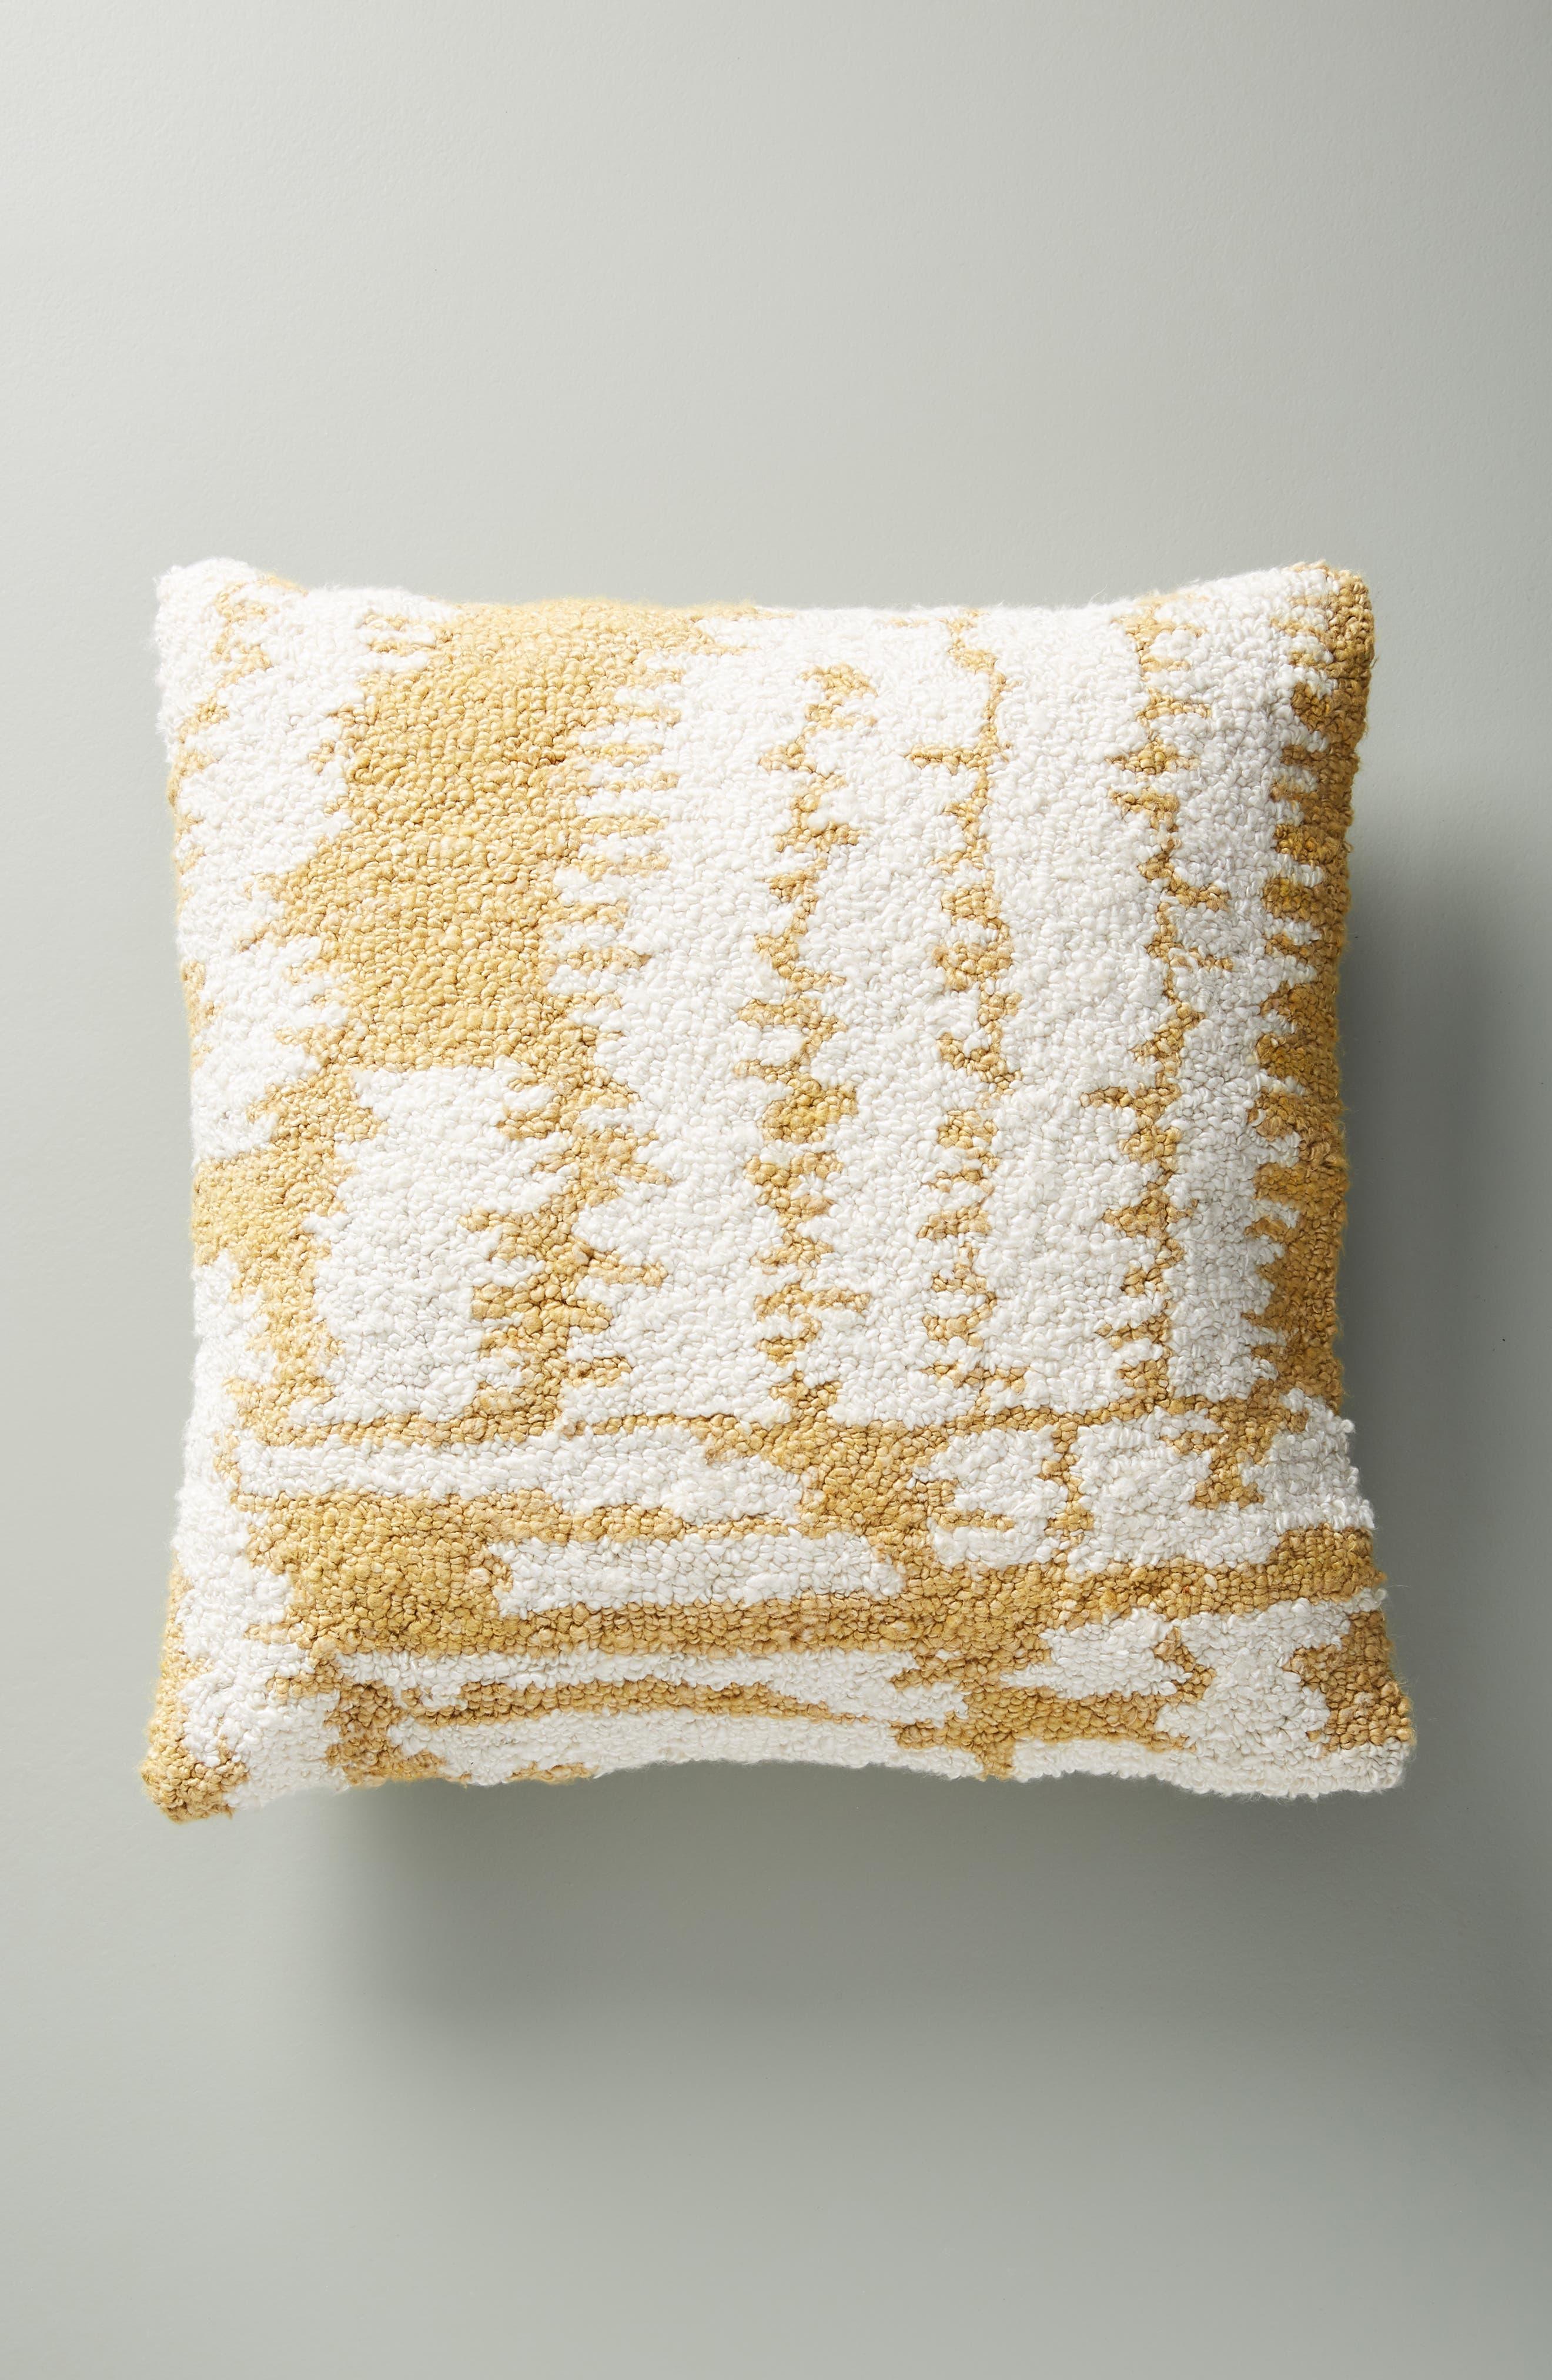 ANTHROPOLOGIE, Jordana Accent Pillow, Main thumbnail 1, color, 700